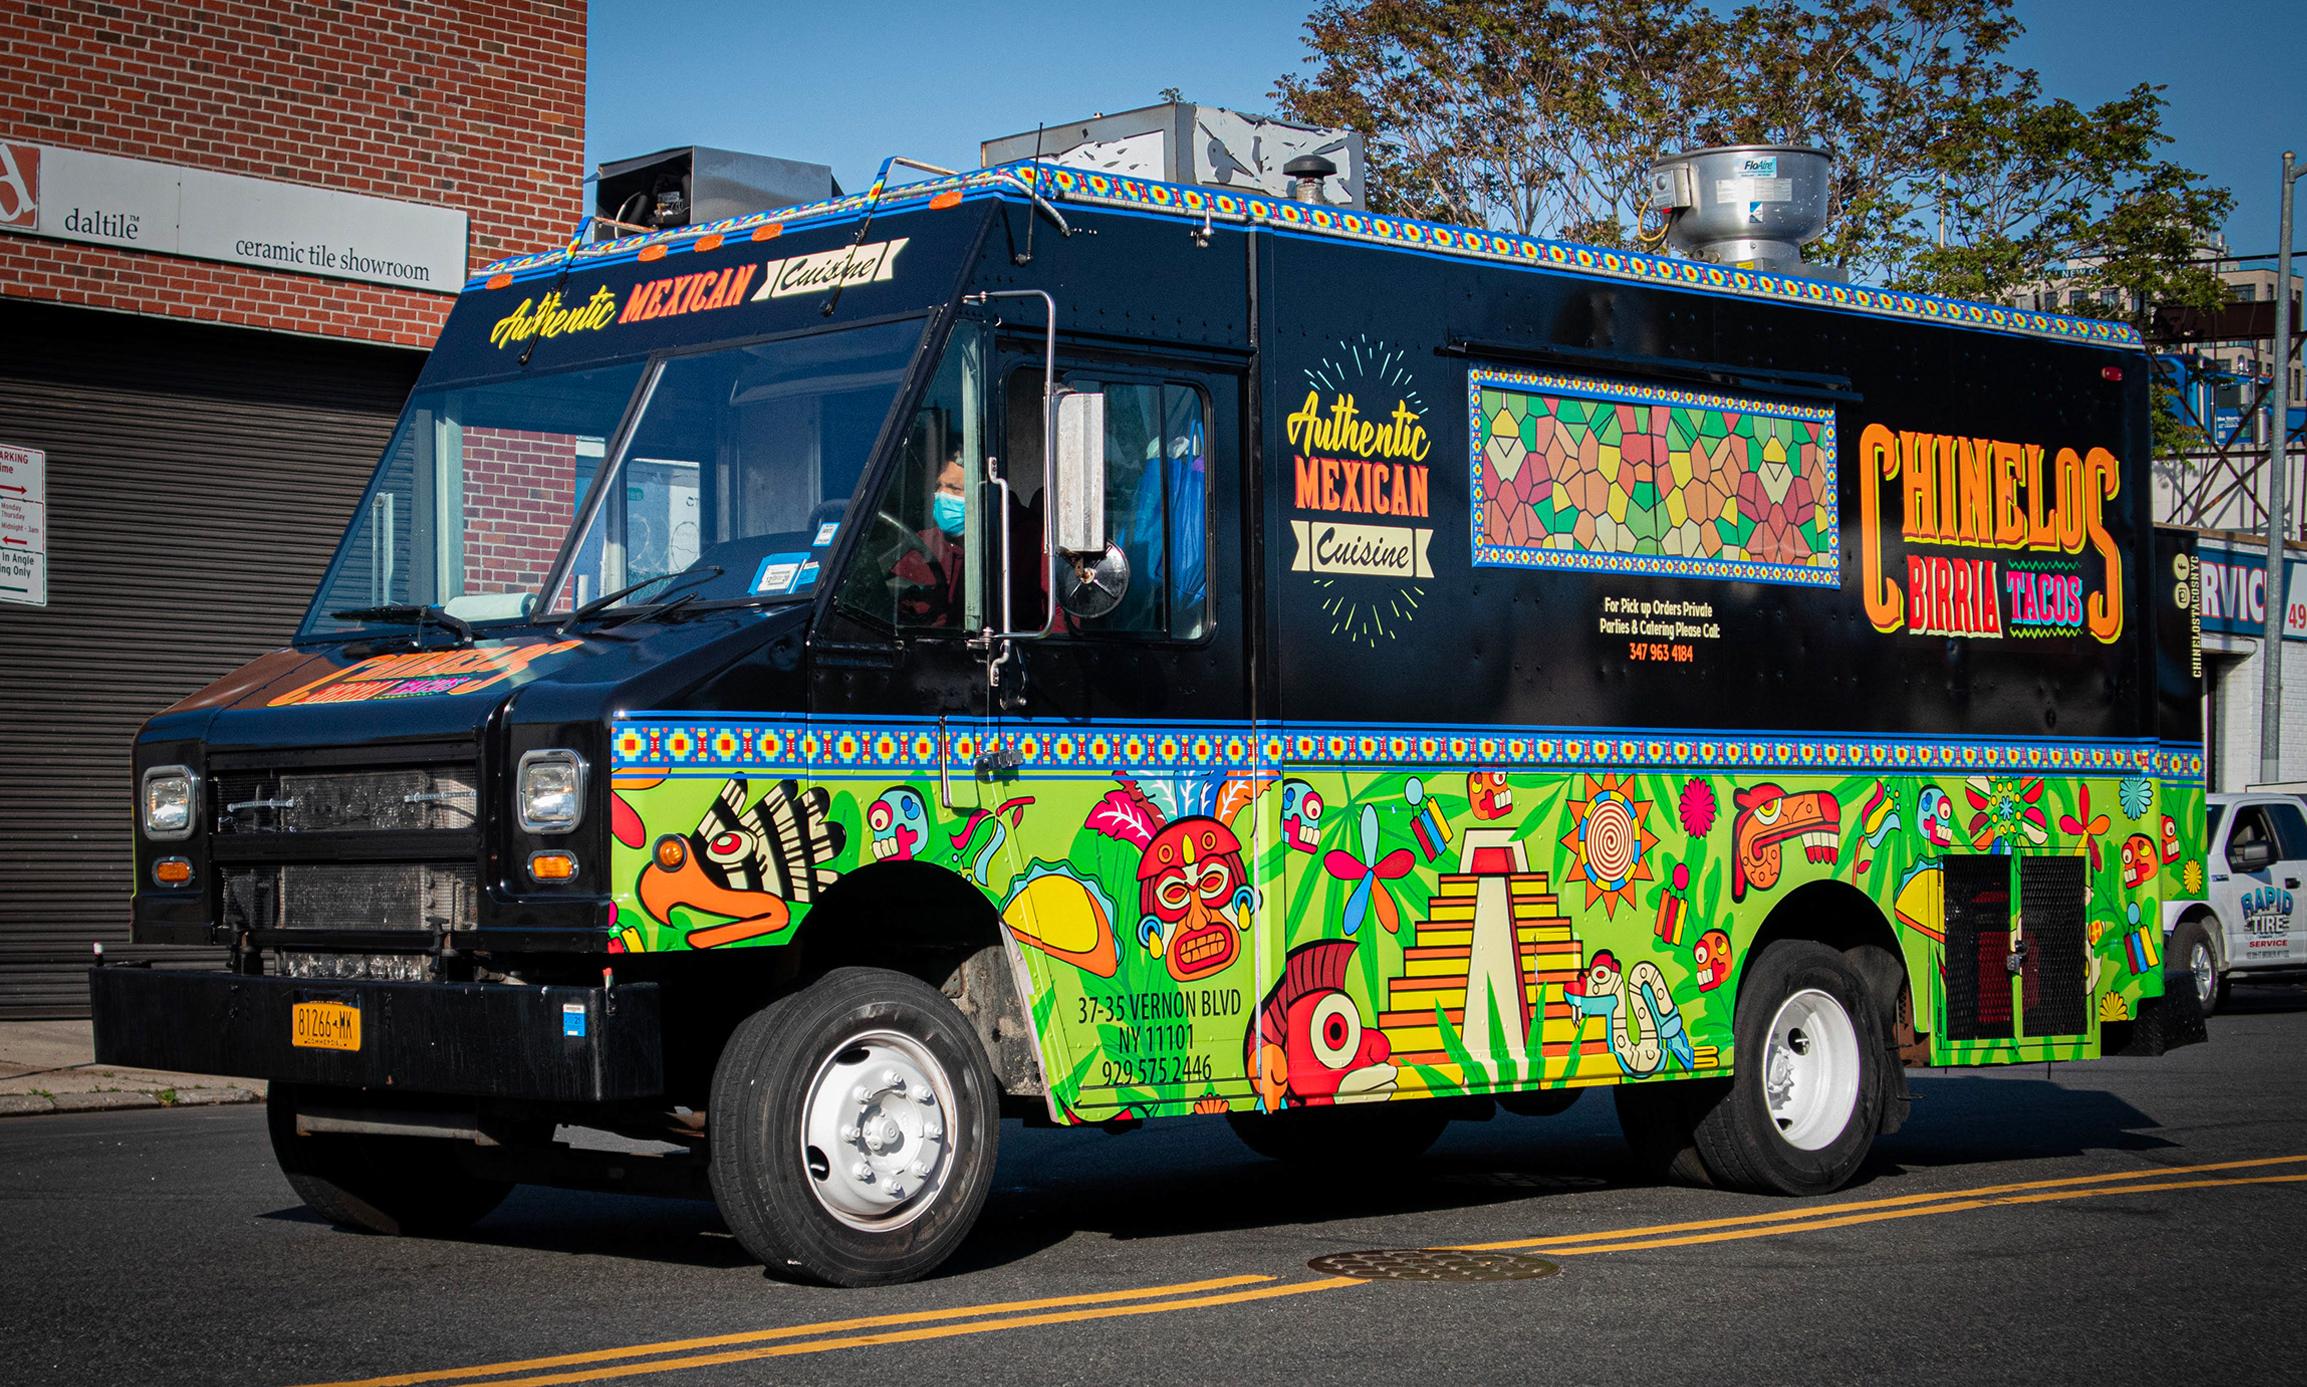 Chinelos Birria Tacos Branding & Food Truck Design